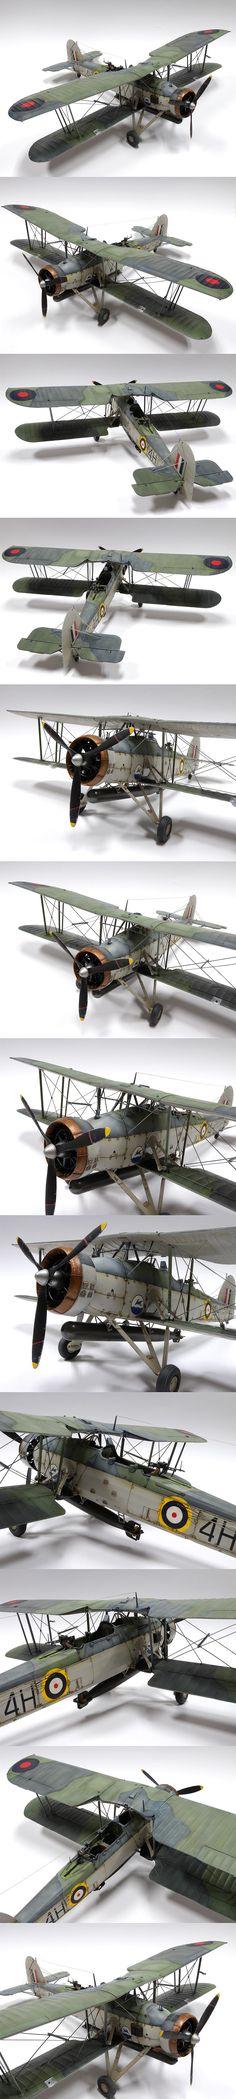 Fairley Swordfish 1/32 Scale Model